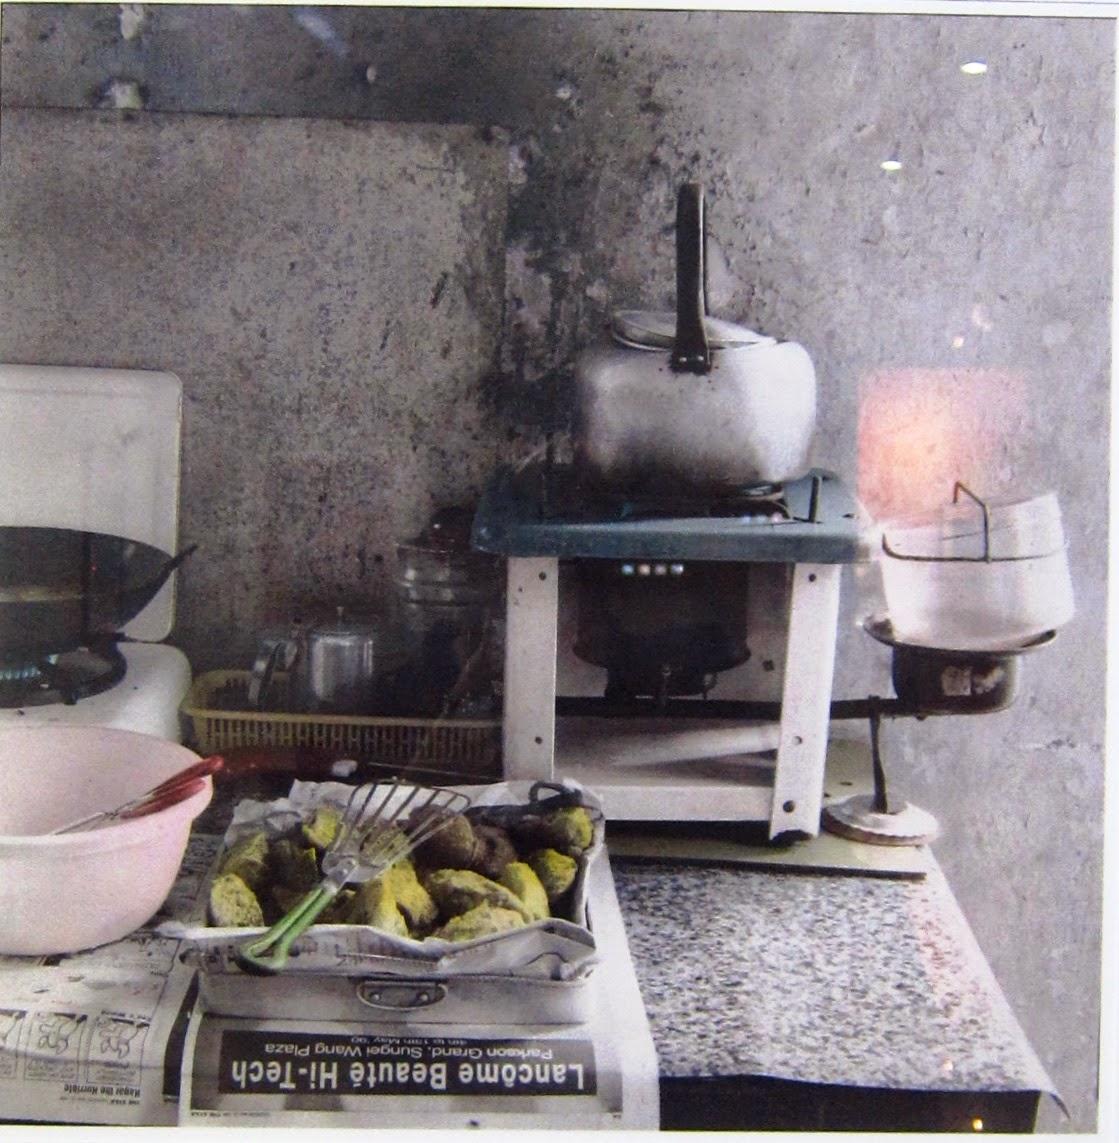 Dapur Minyak Gas Jerang Air Goring Cucur Kerosene Stove Cooker Water Boiling Fritters Frying 1990